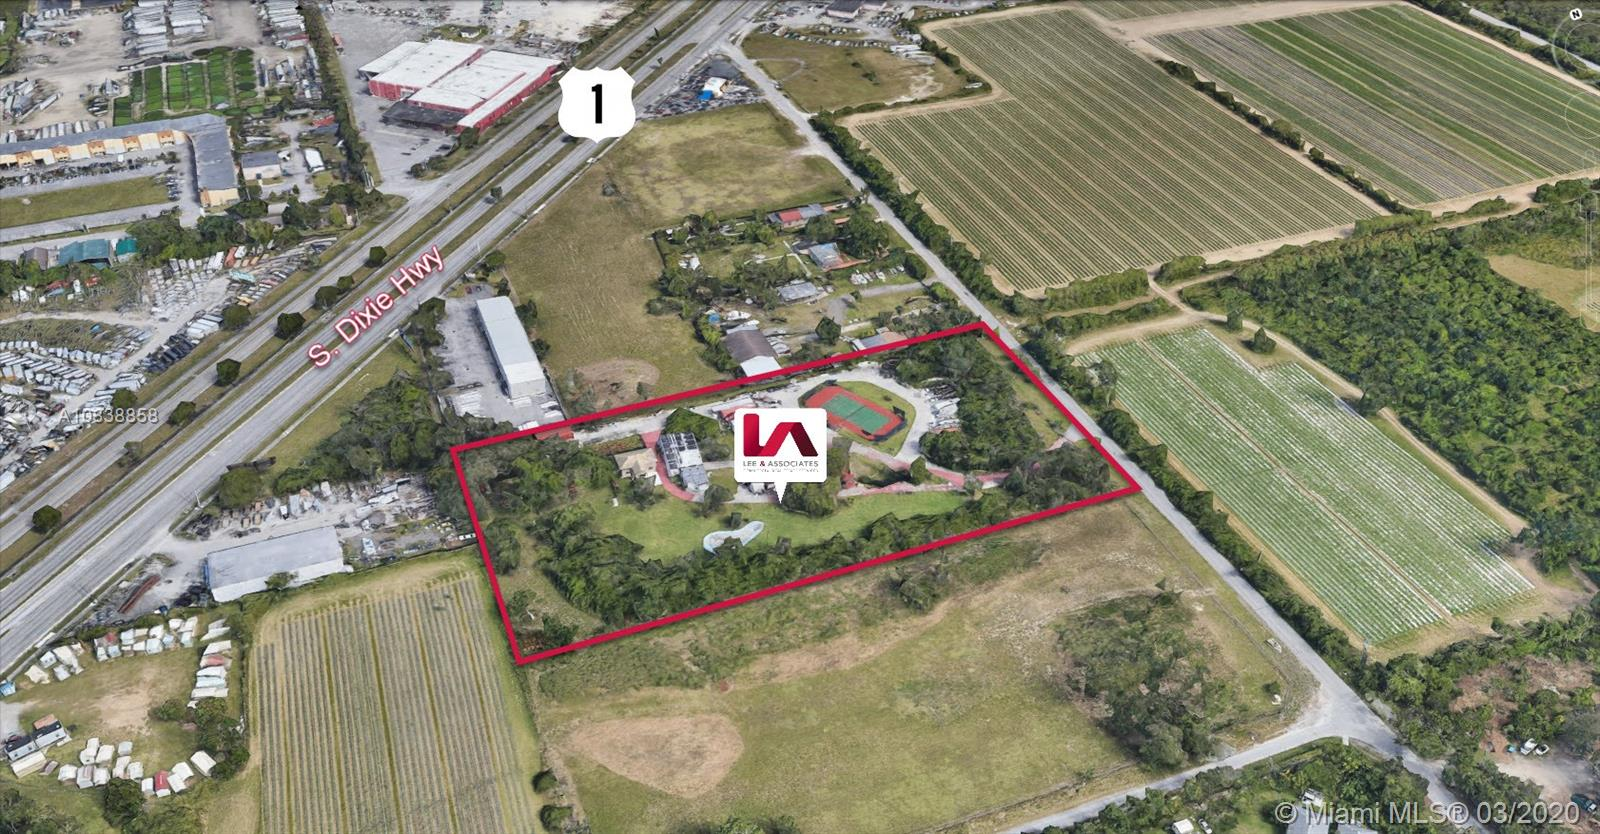 24040 SW 129th Ave, Homestead, FL 33032 - Homestead, FL real estate listing